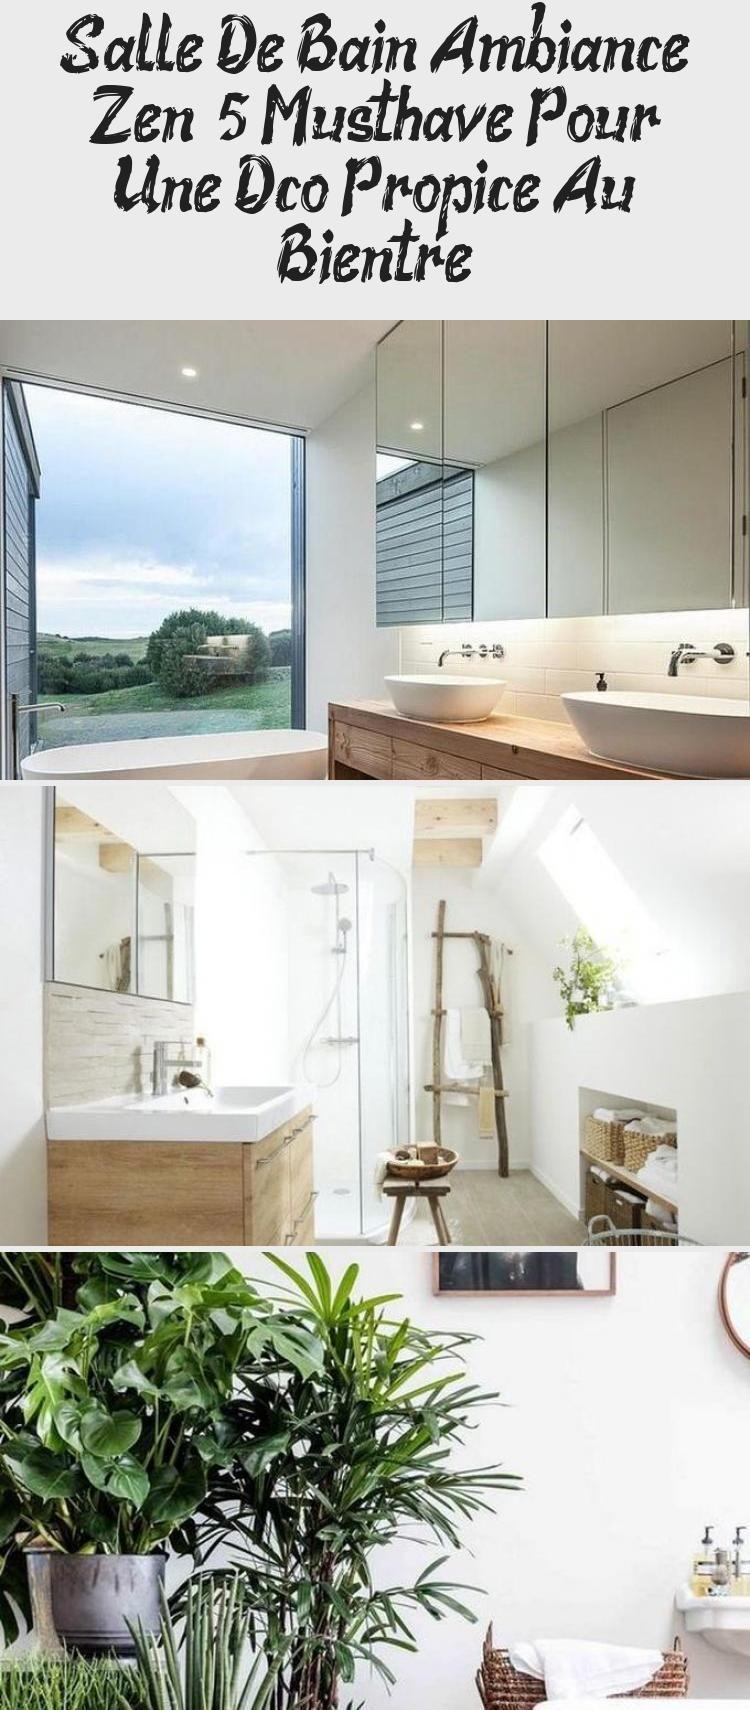 Salle De Bain Ambiance Zen 5 Indispensables Clem Around The Corner Meuble De Salle De Bain Double Lavabo Vasques Blanch In 2020 Bathroom Interior Interior Bathroom